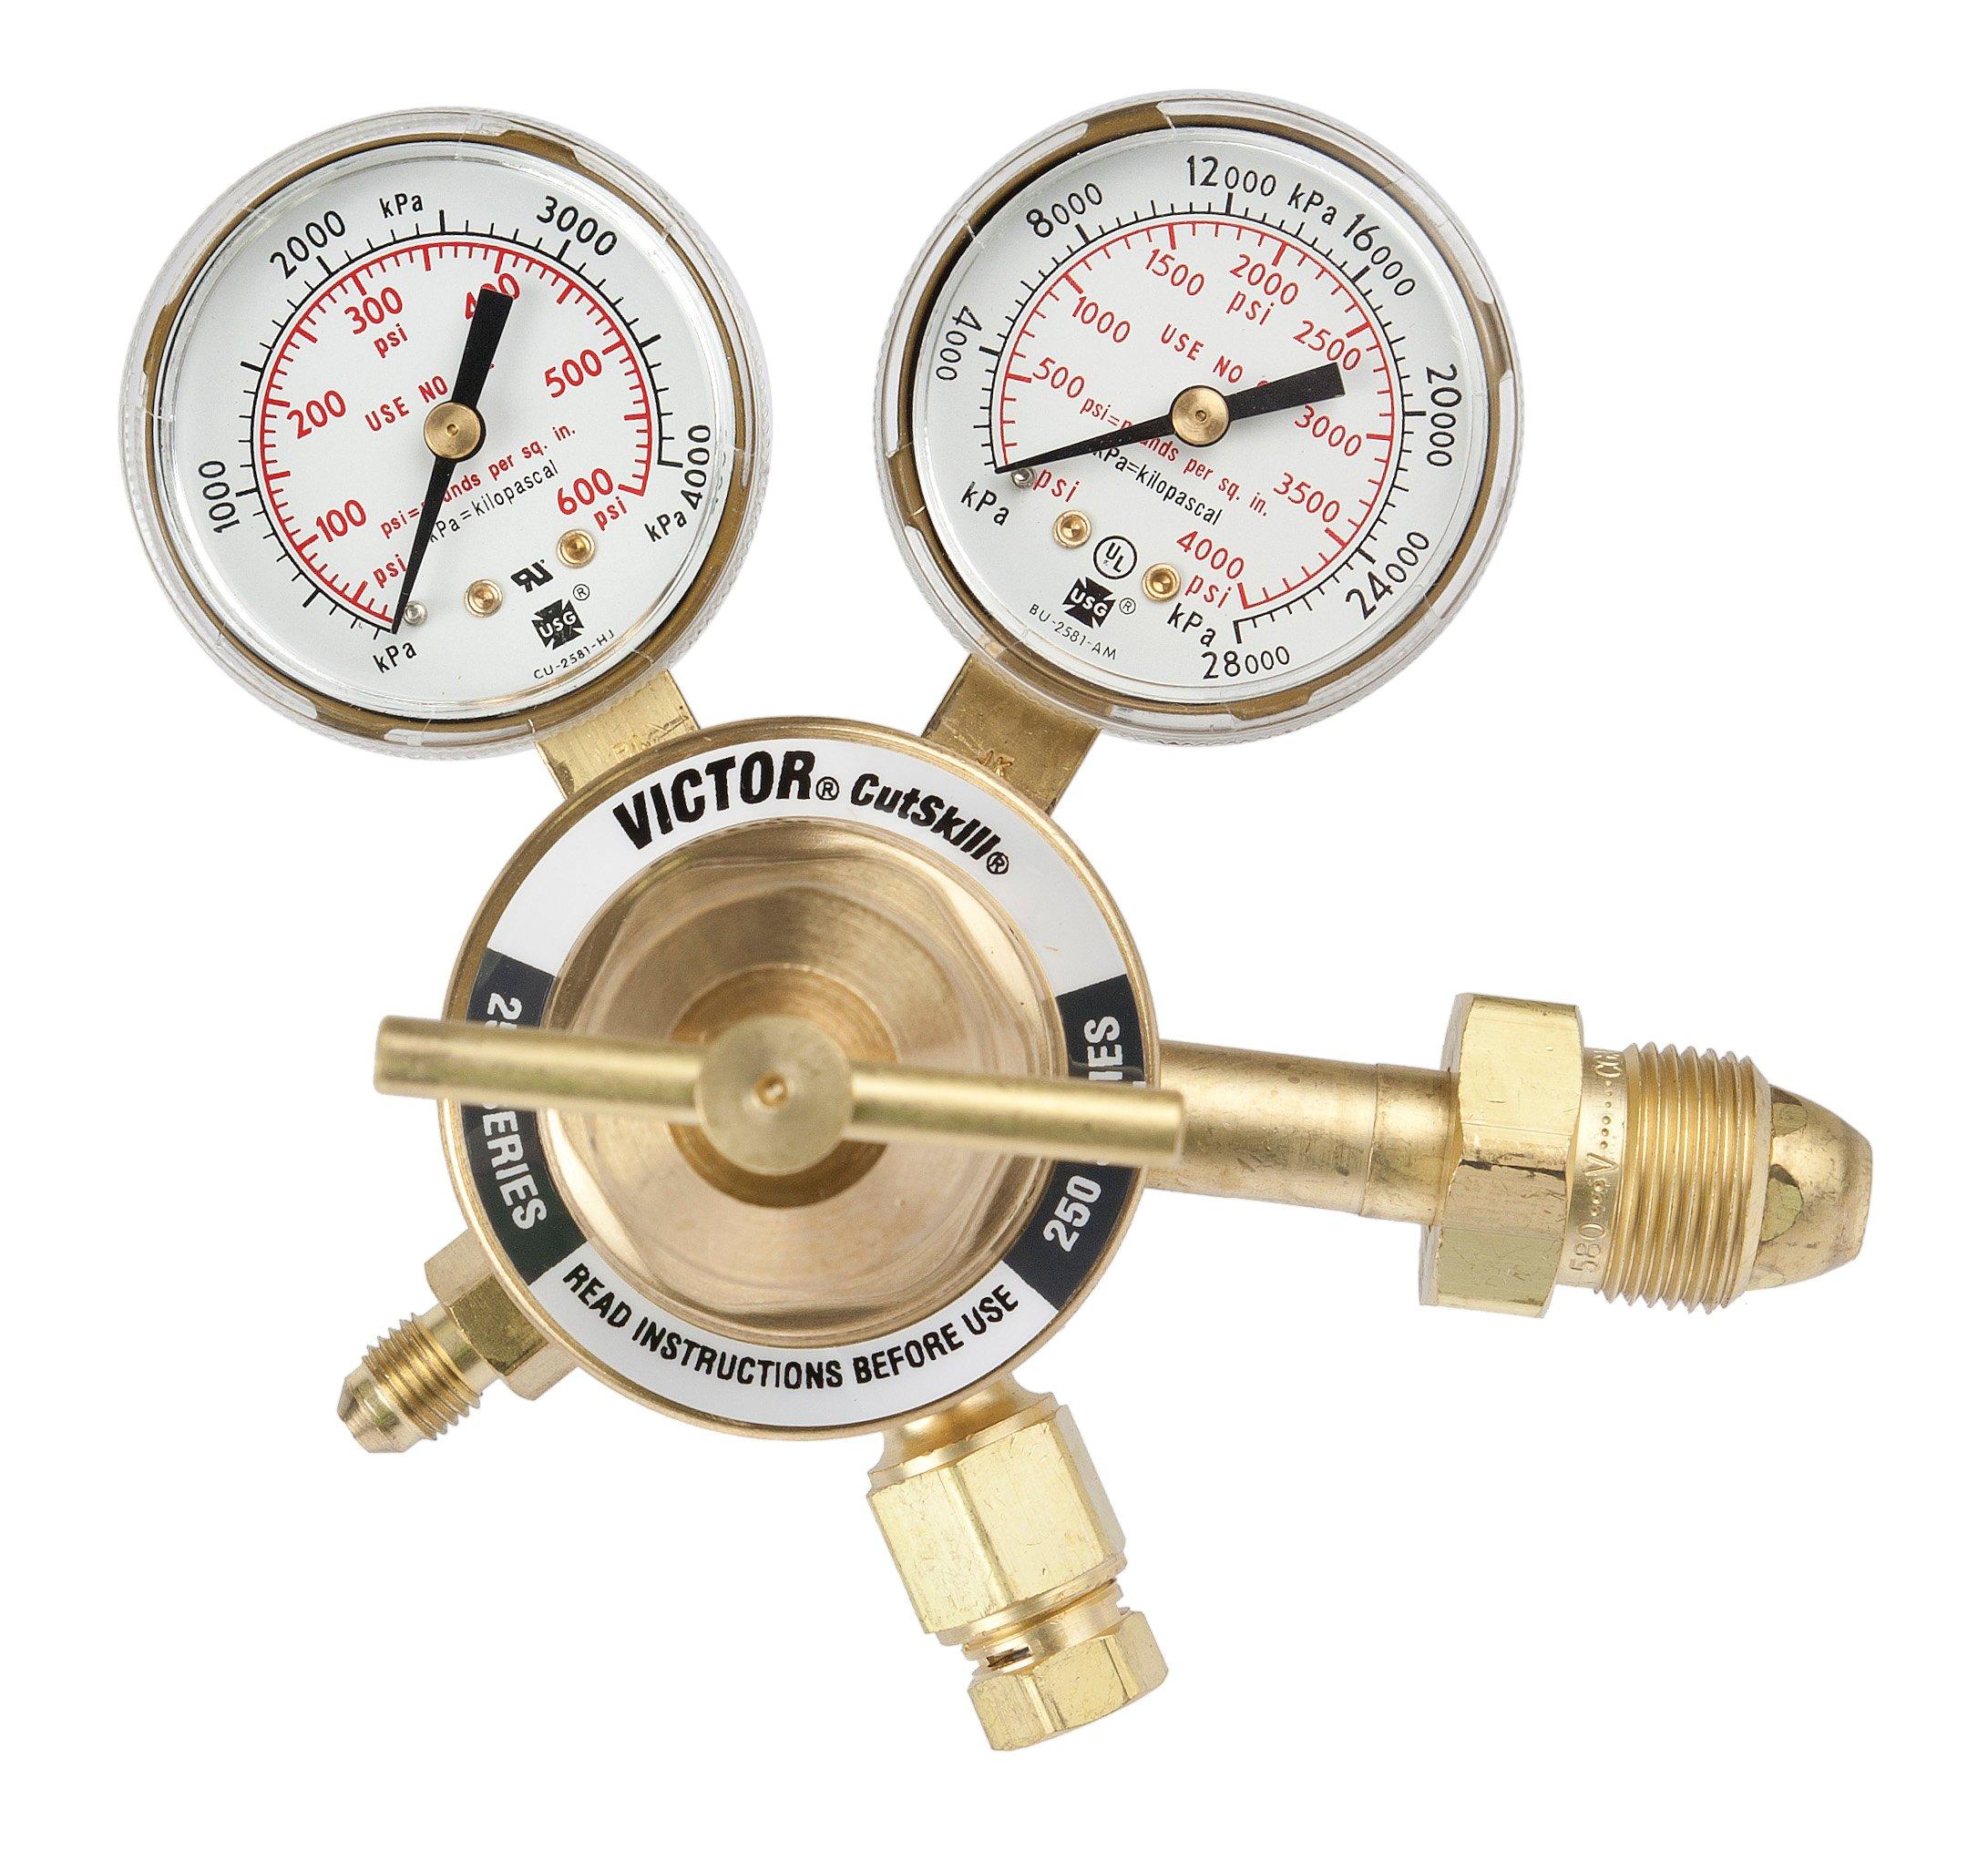 Victor 0781-9135 Model TPR 250-500-580 CS Purging Regulator, 10-250 psig